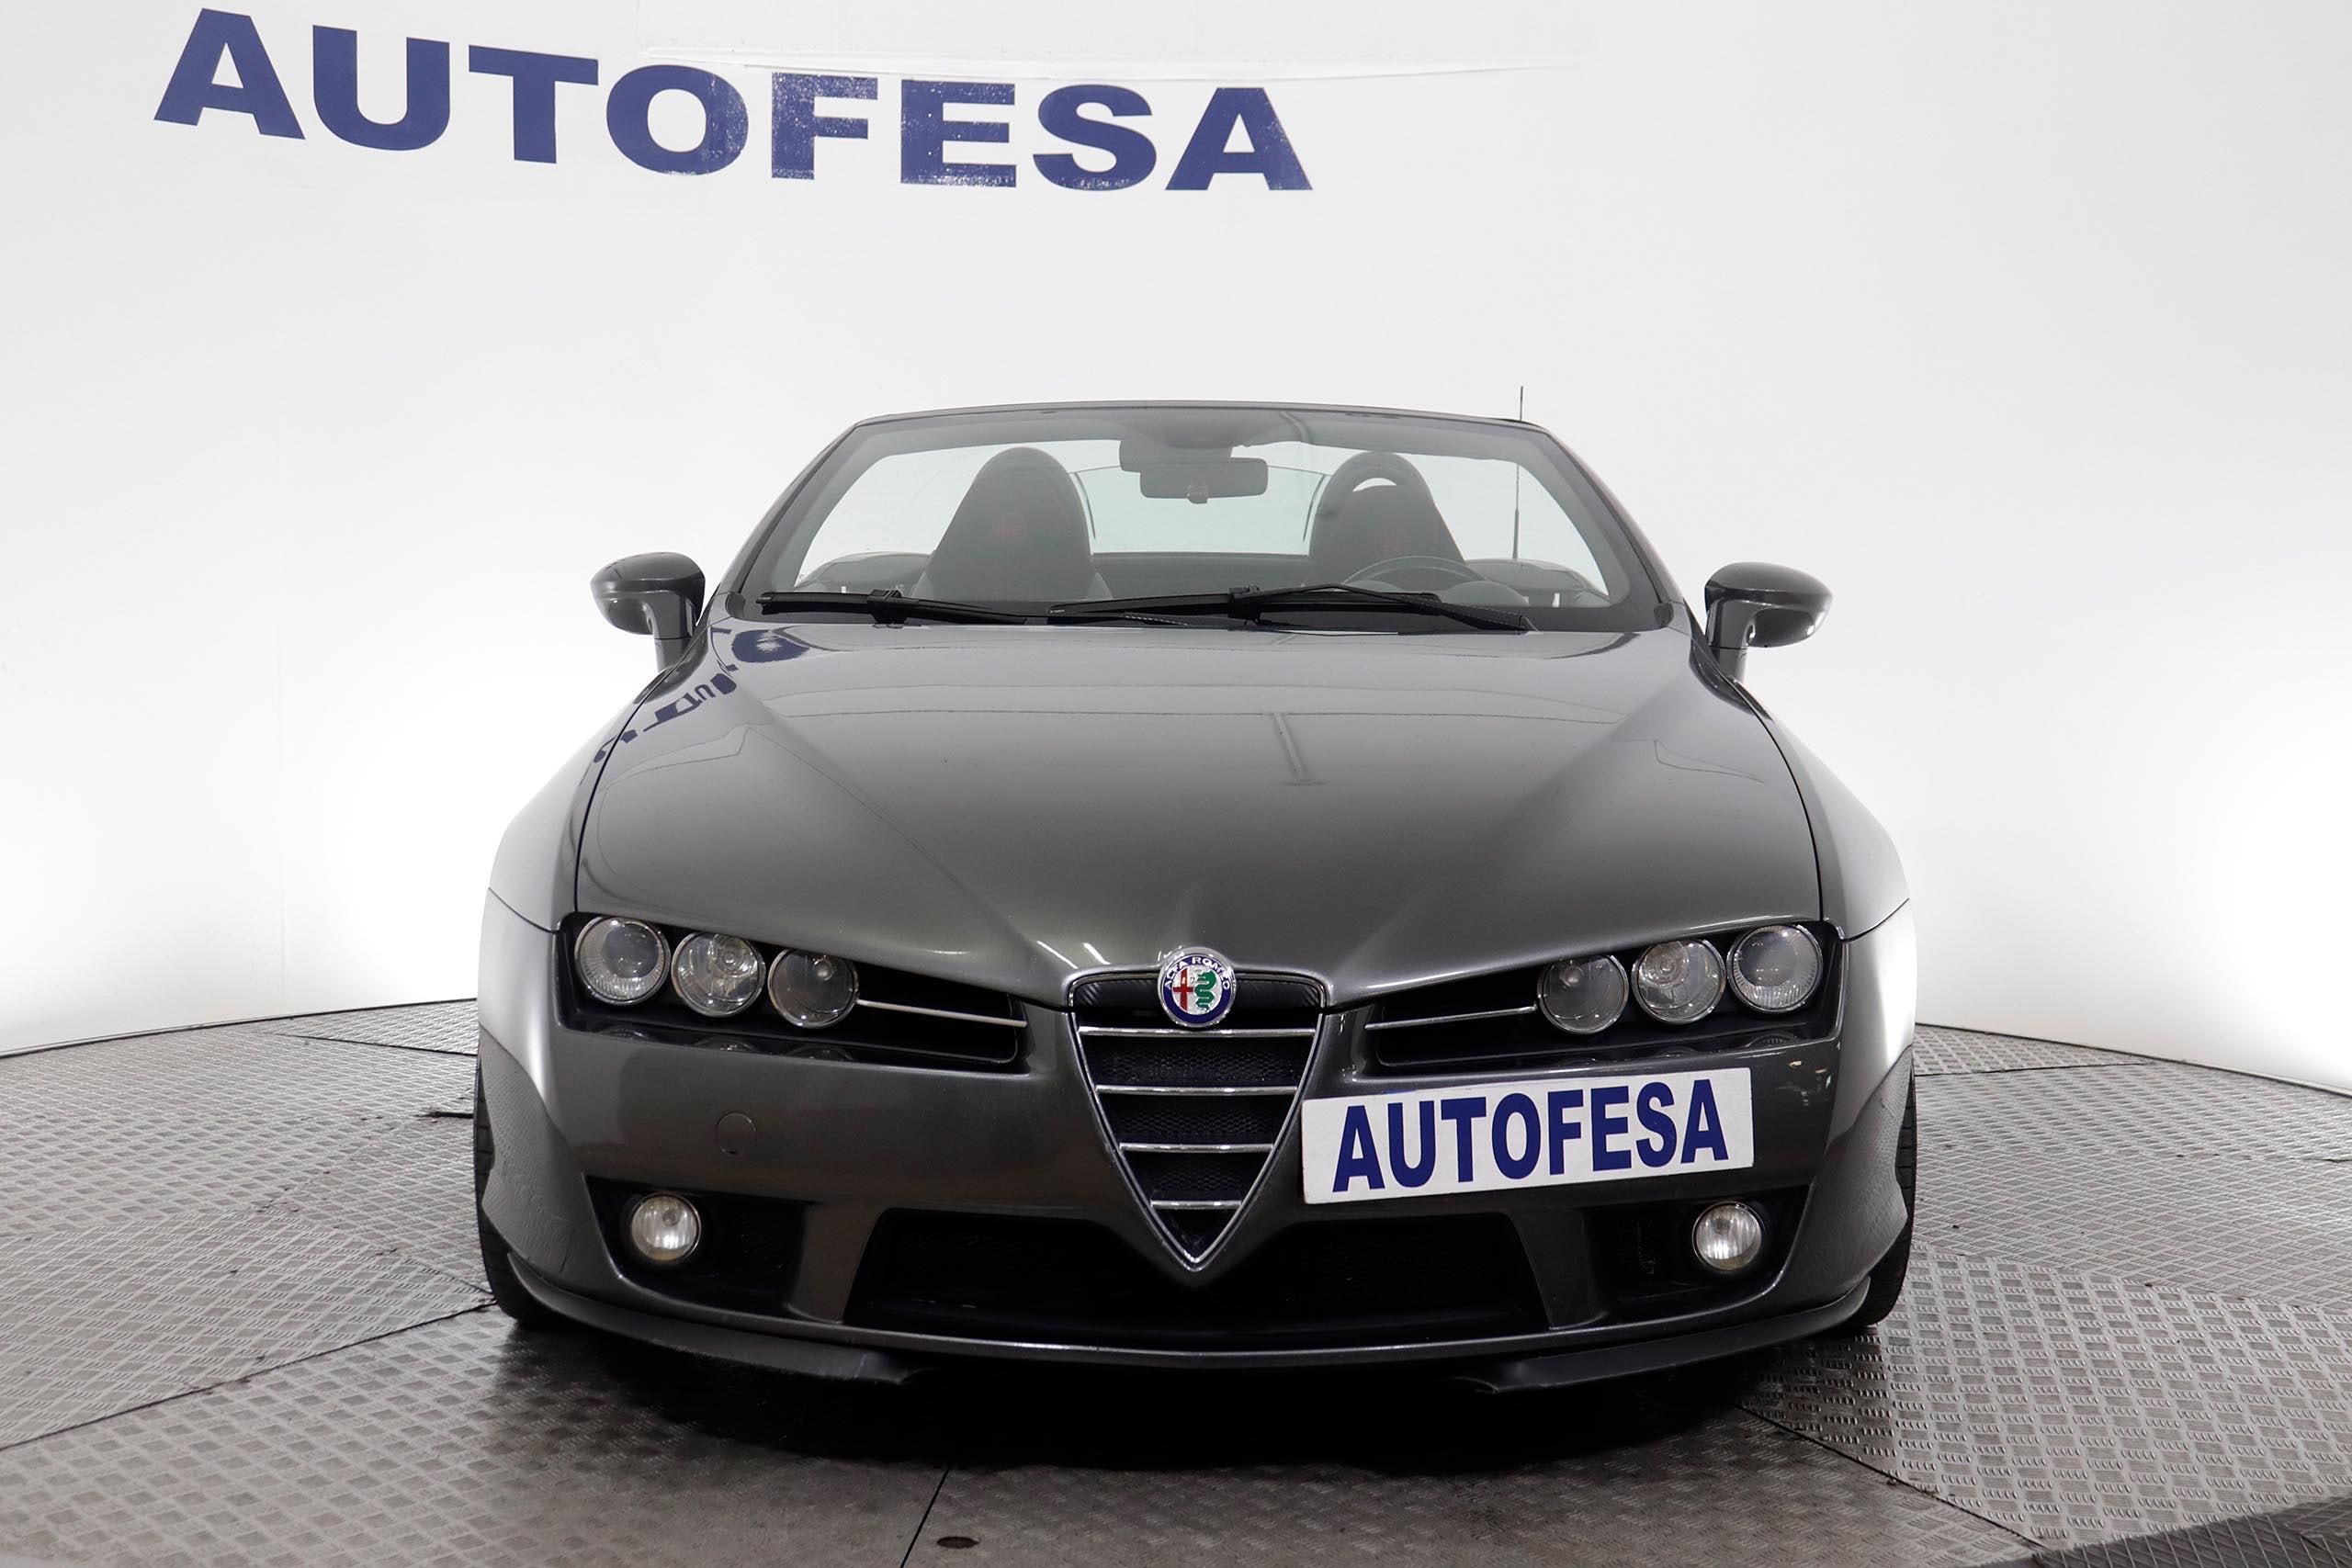 Alfa Romeo Spider 2.4 JTDm 200cv Distinctive 2p - Foto 2